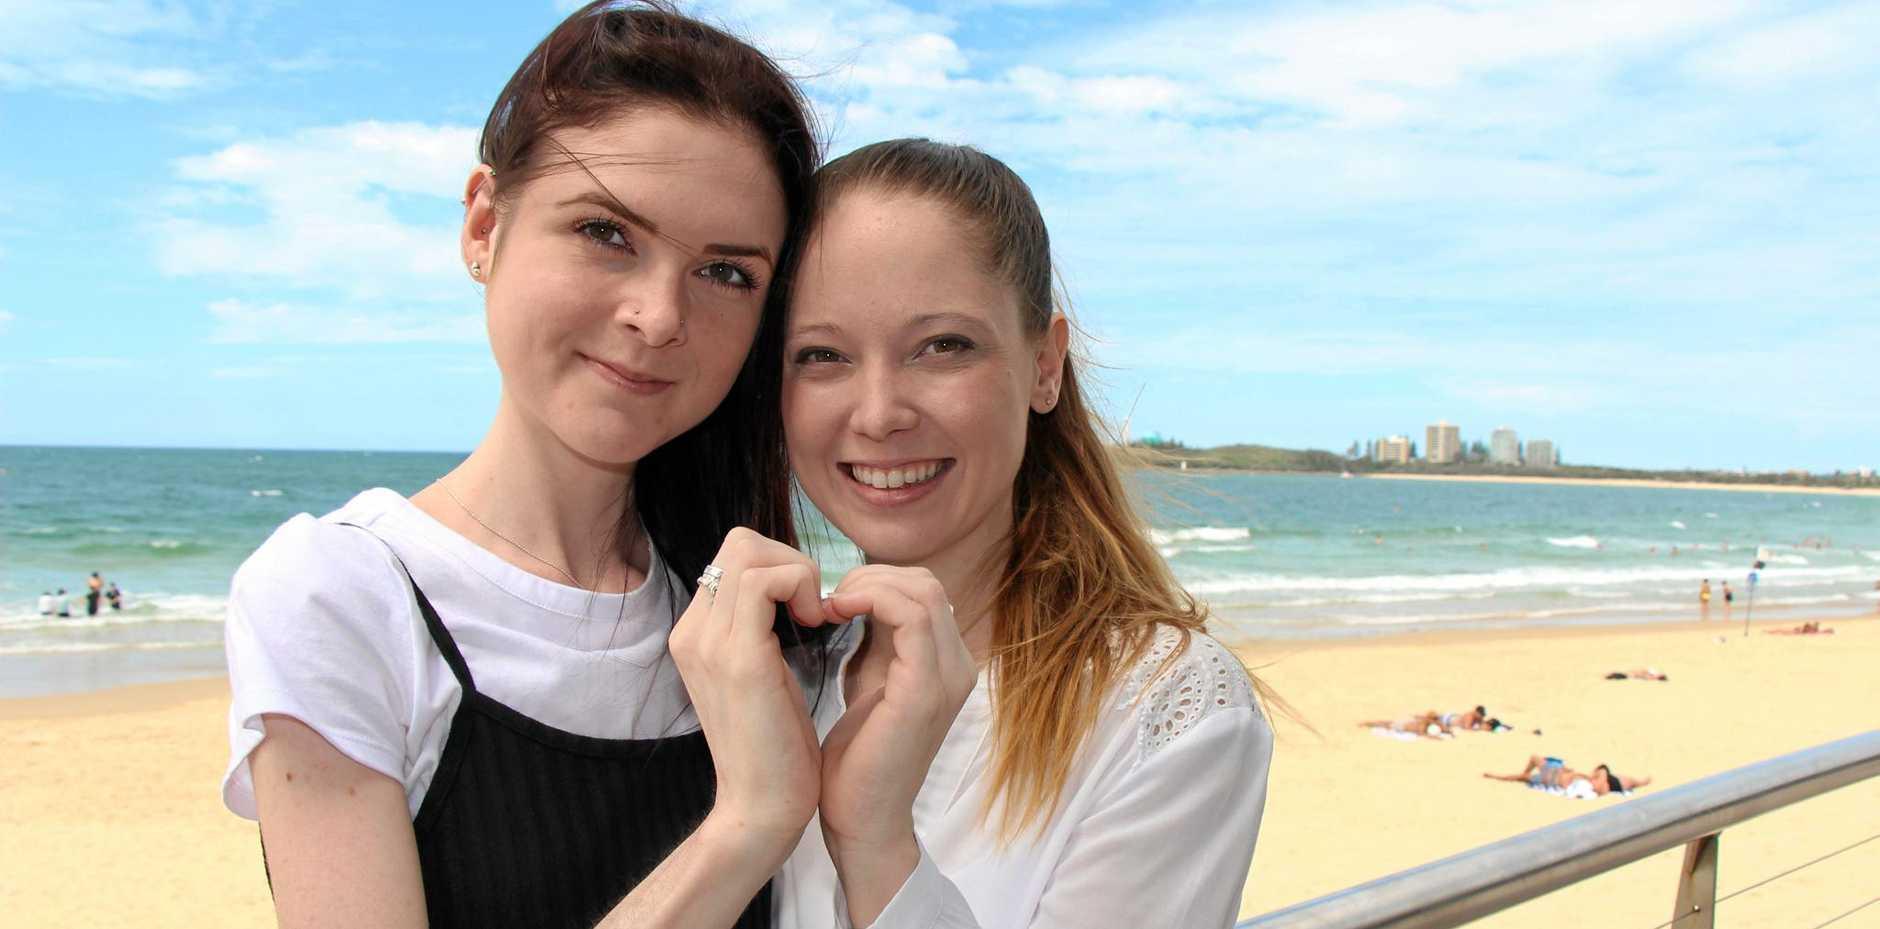 UNBREAKABLE: Bree Morrison and  Tanya Kretschmann have developed an unbreakable bond.